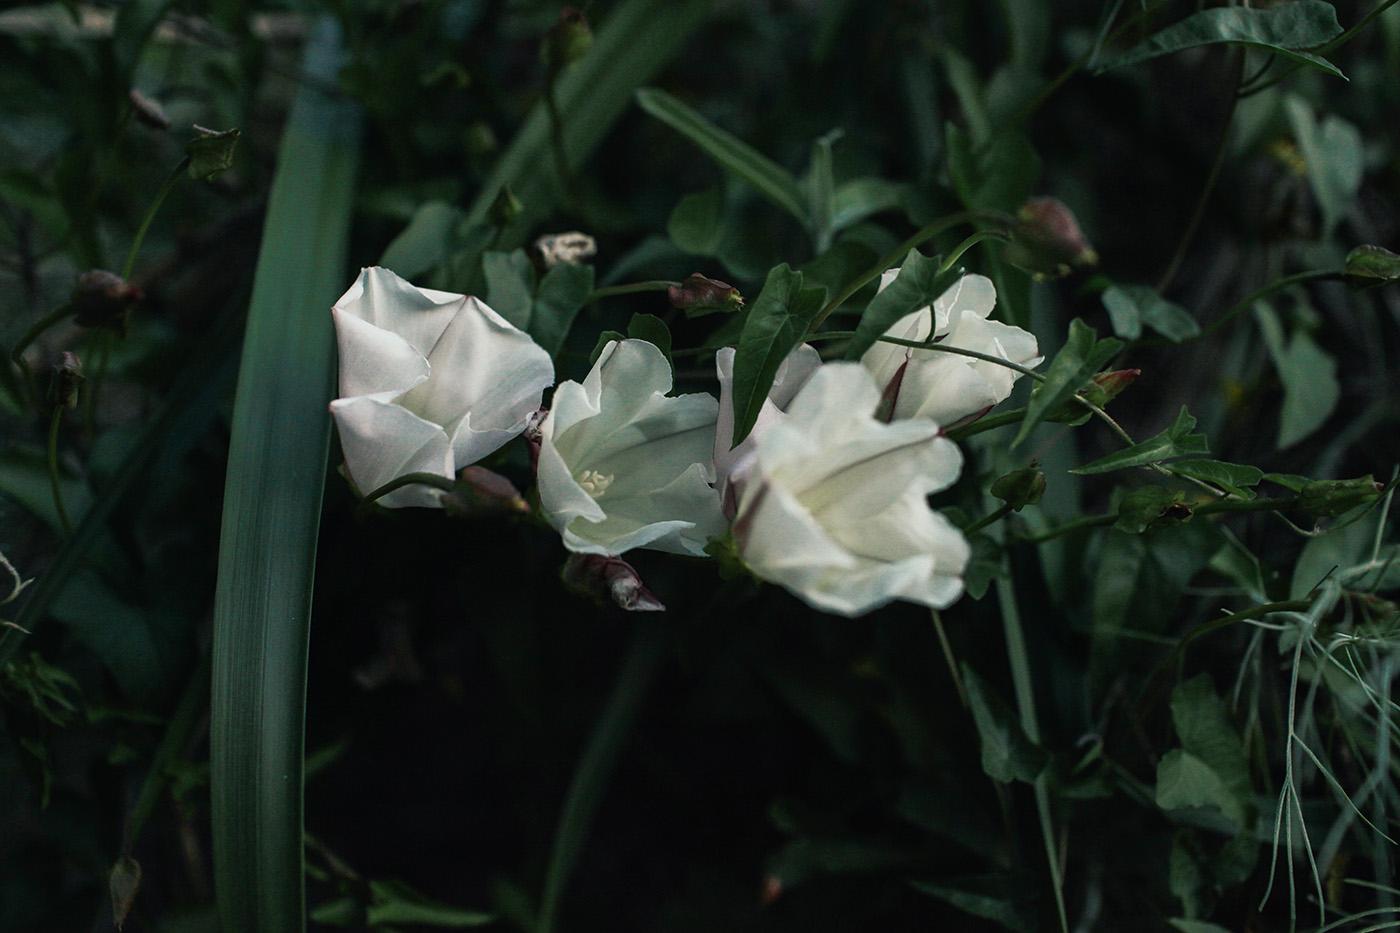 anna-zajac-11.jpg